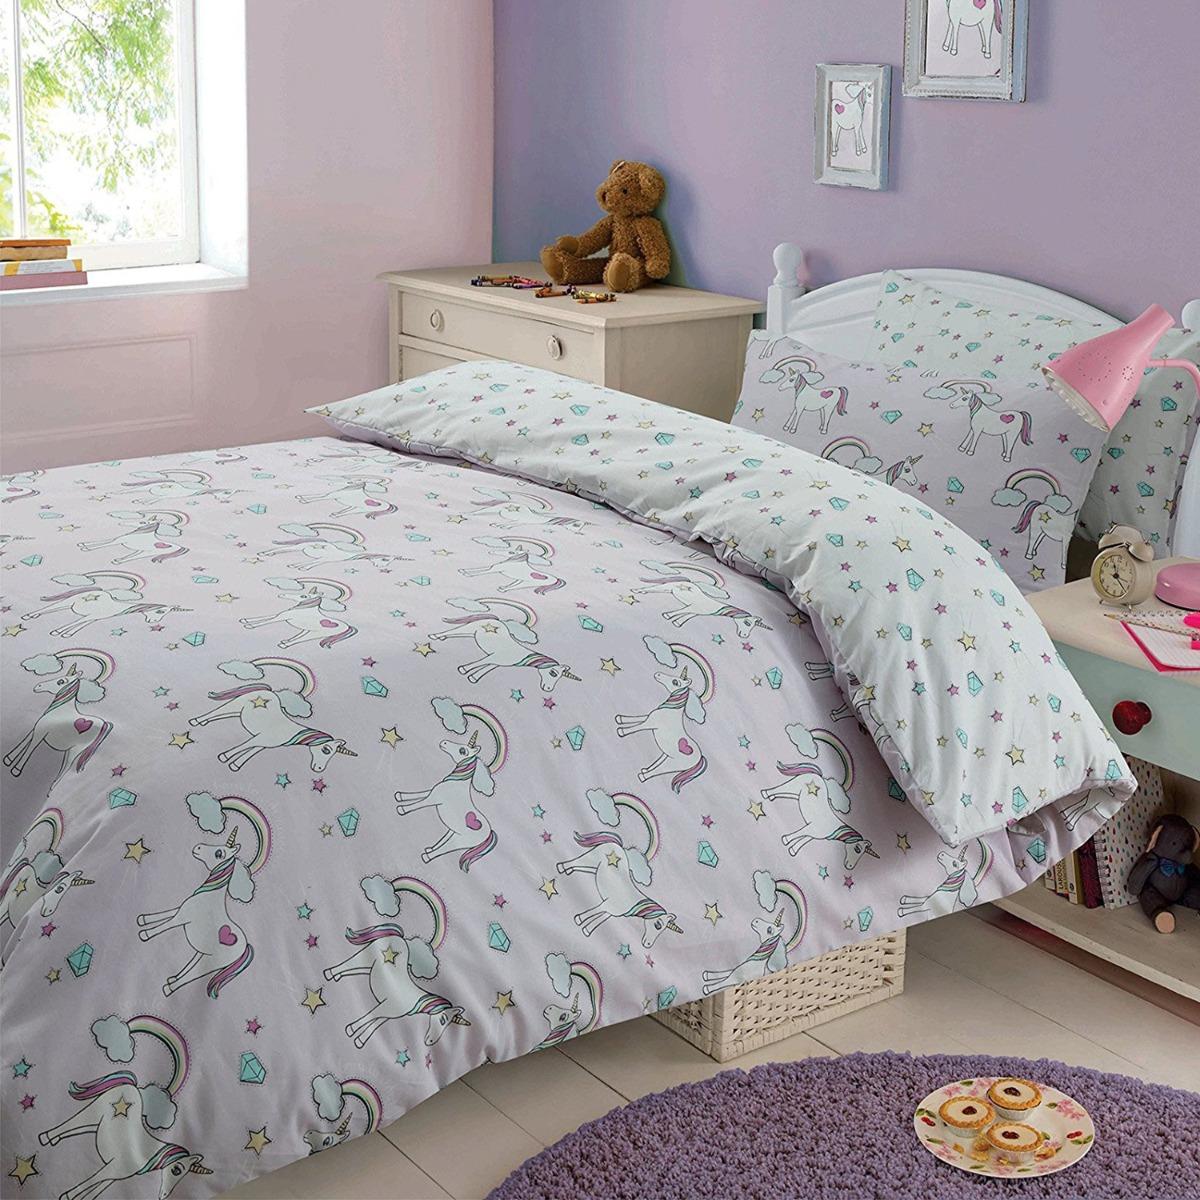 Magic Unicorns Single Duvet Cover And Pillowcase Set